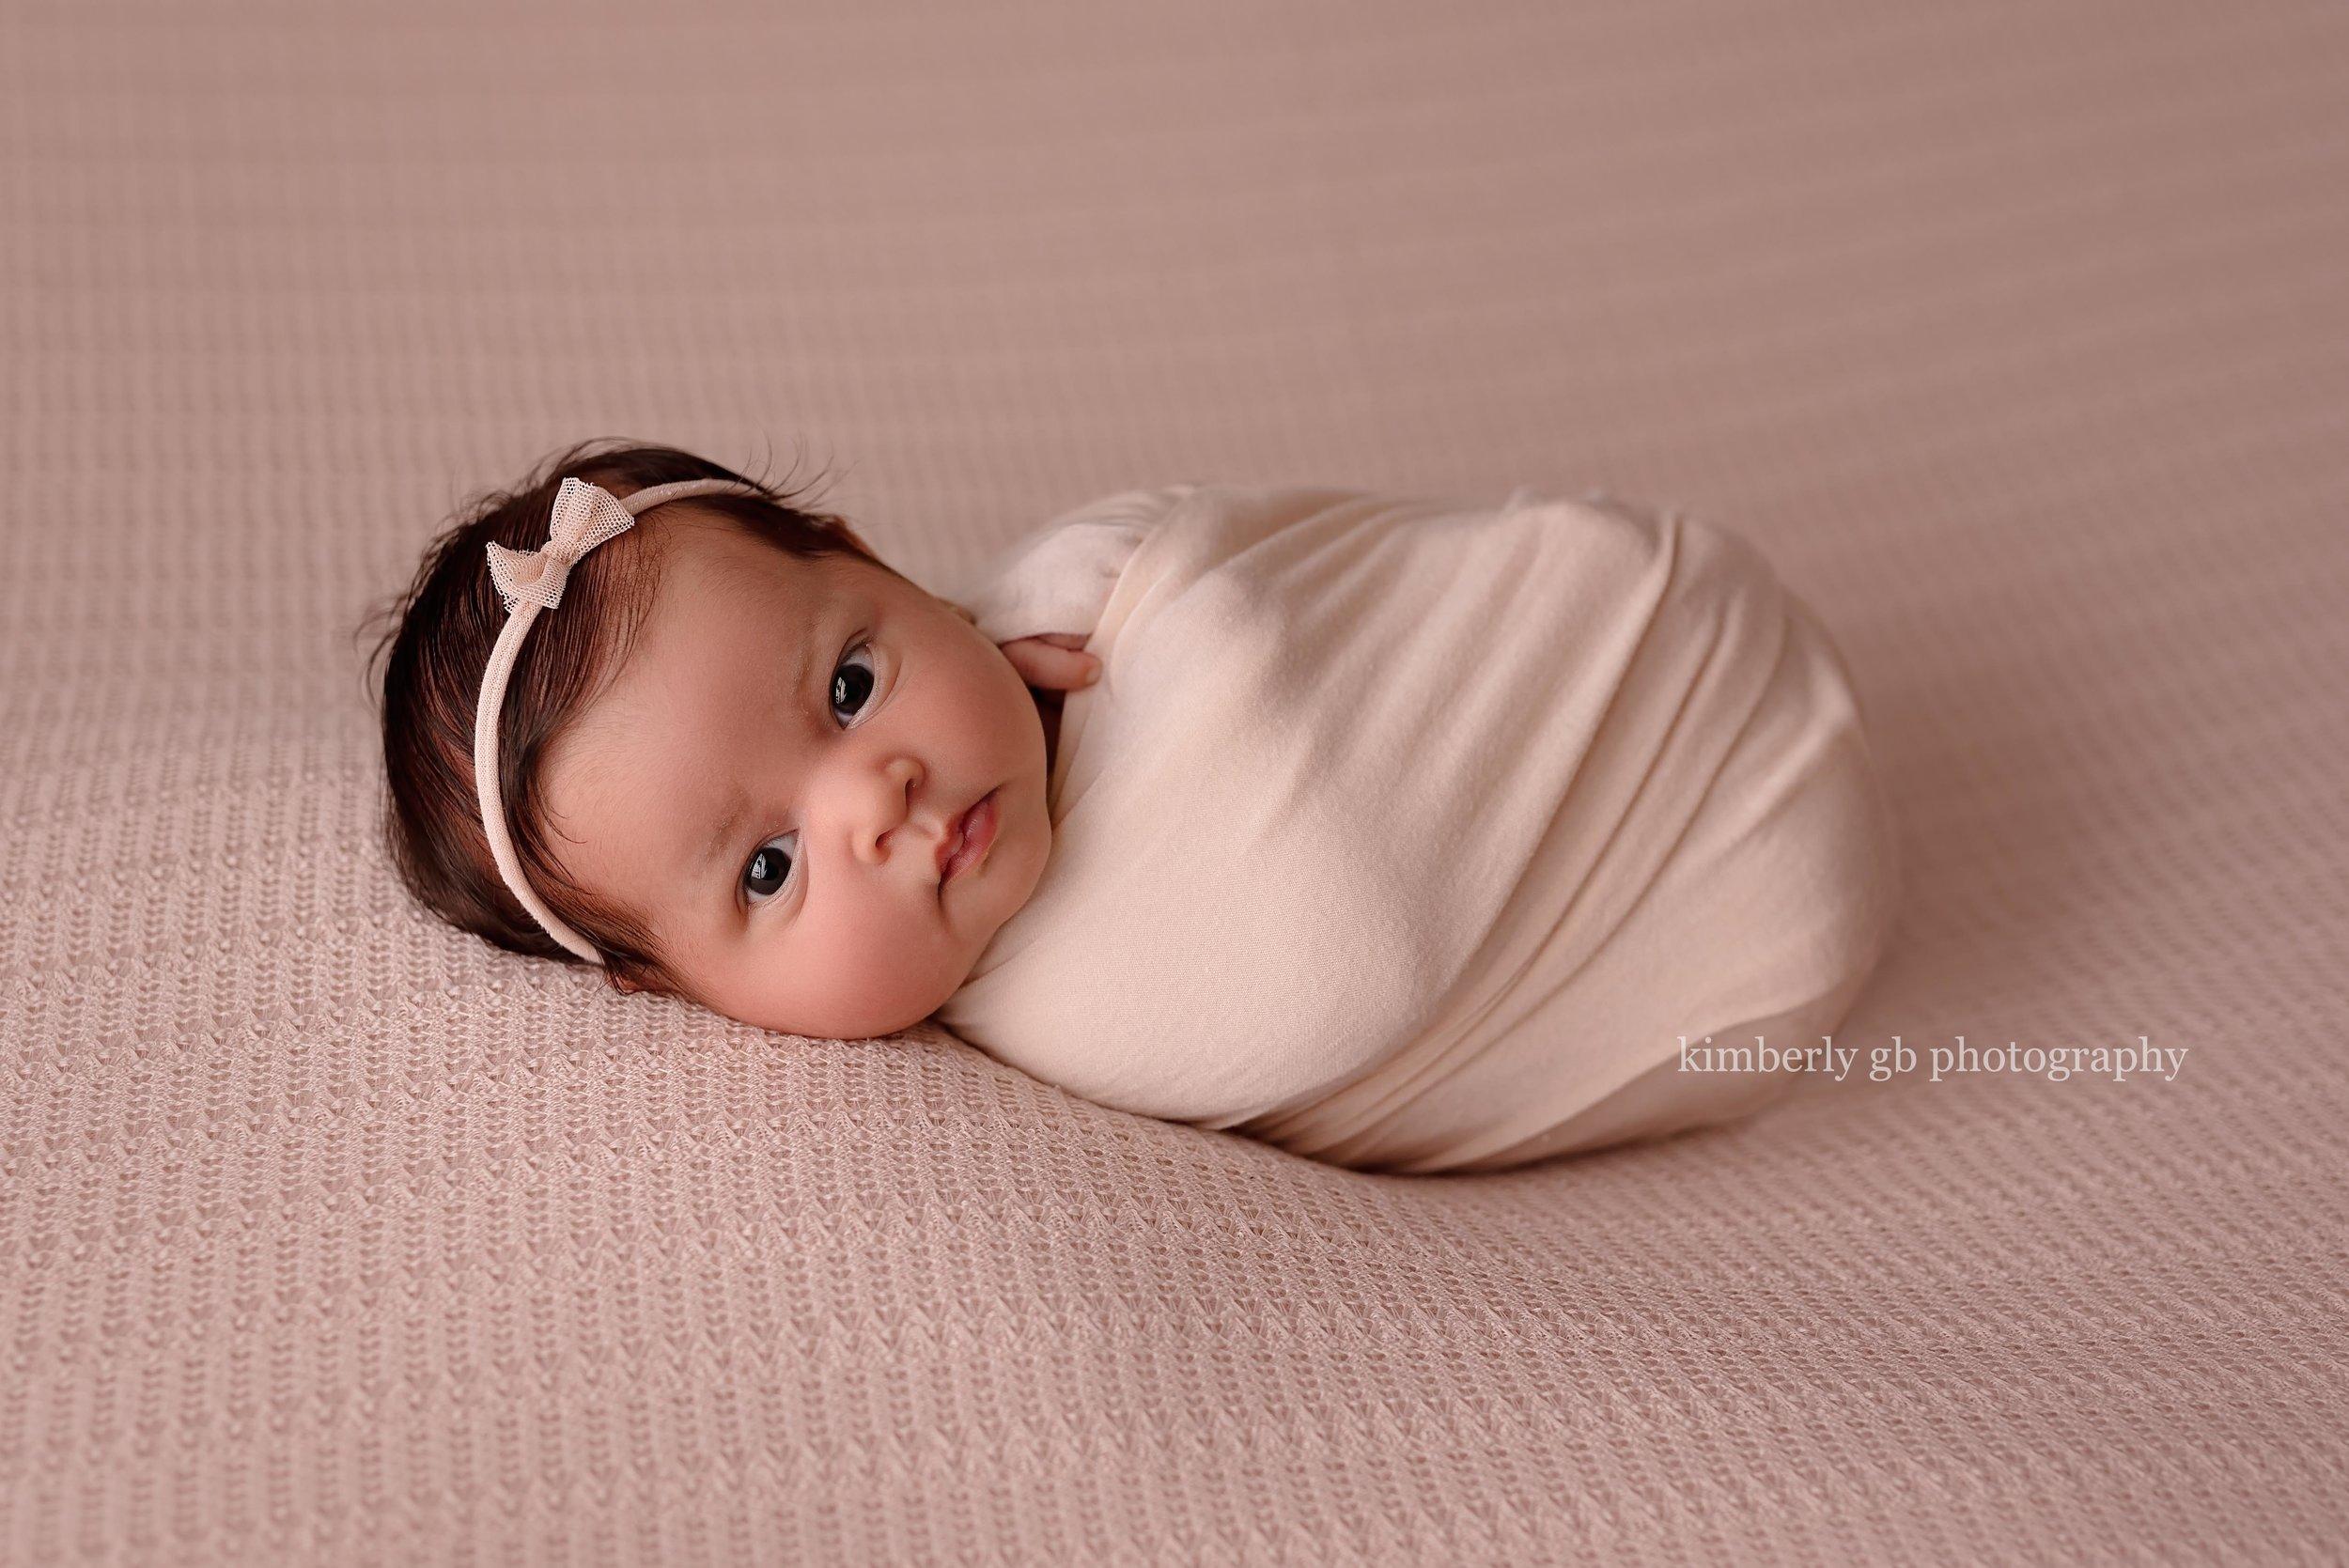 fotografia-de-recien-nacidos-bebes-newborn-en-puerto-rico-kimberly-gb-photography-fotografa-283.jpg